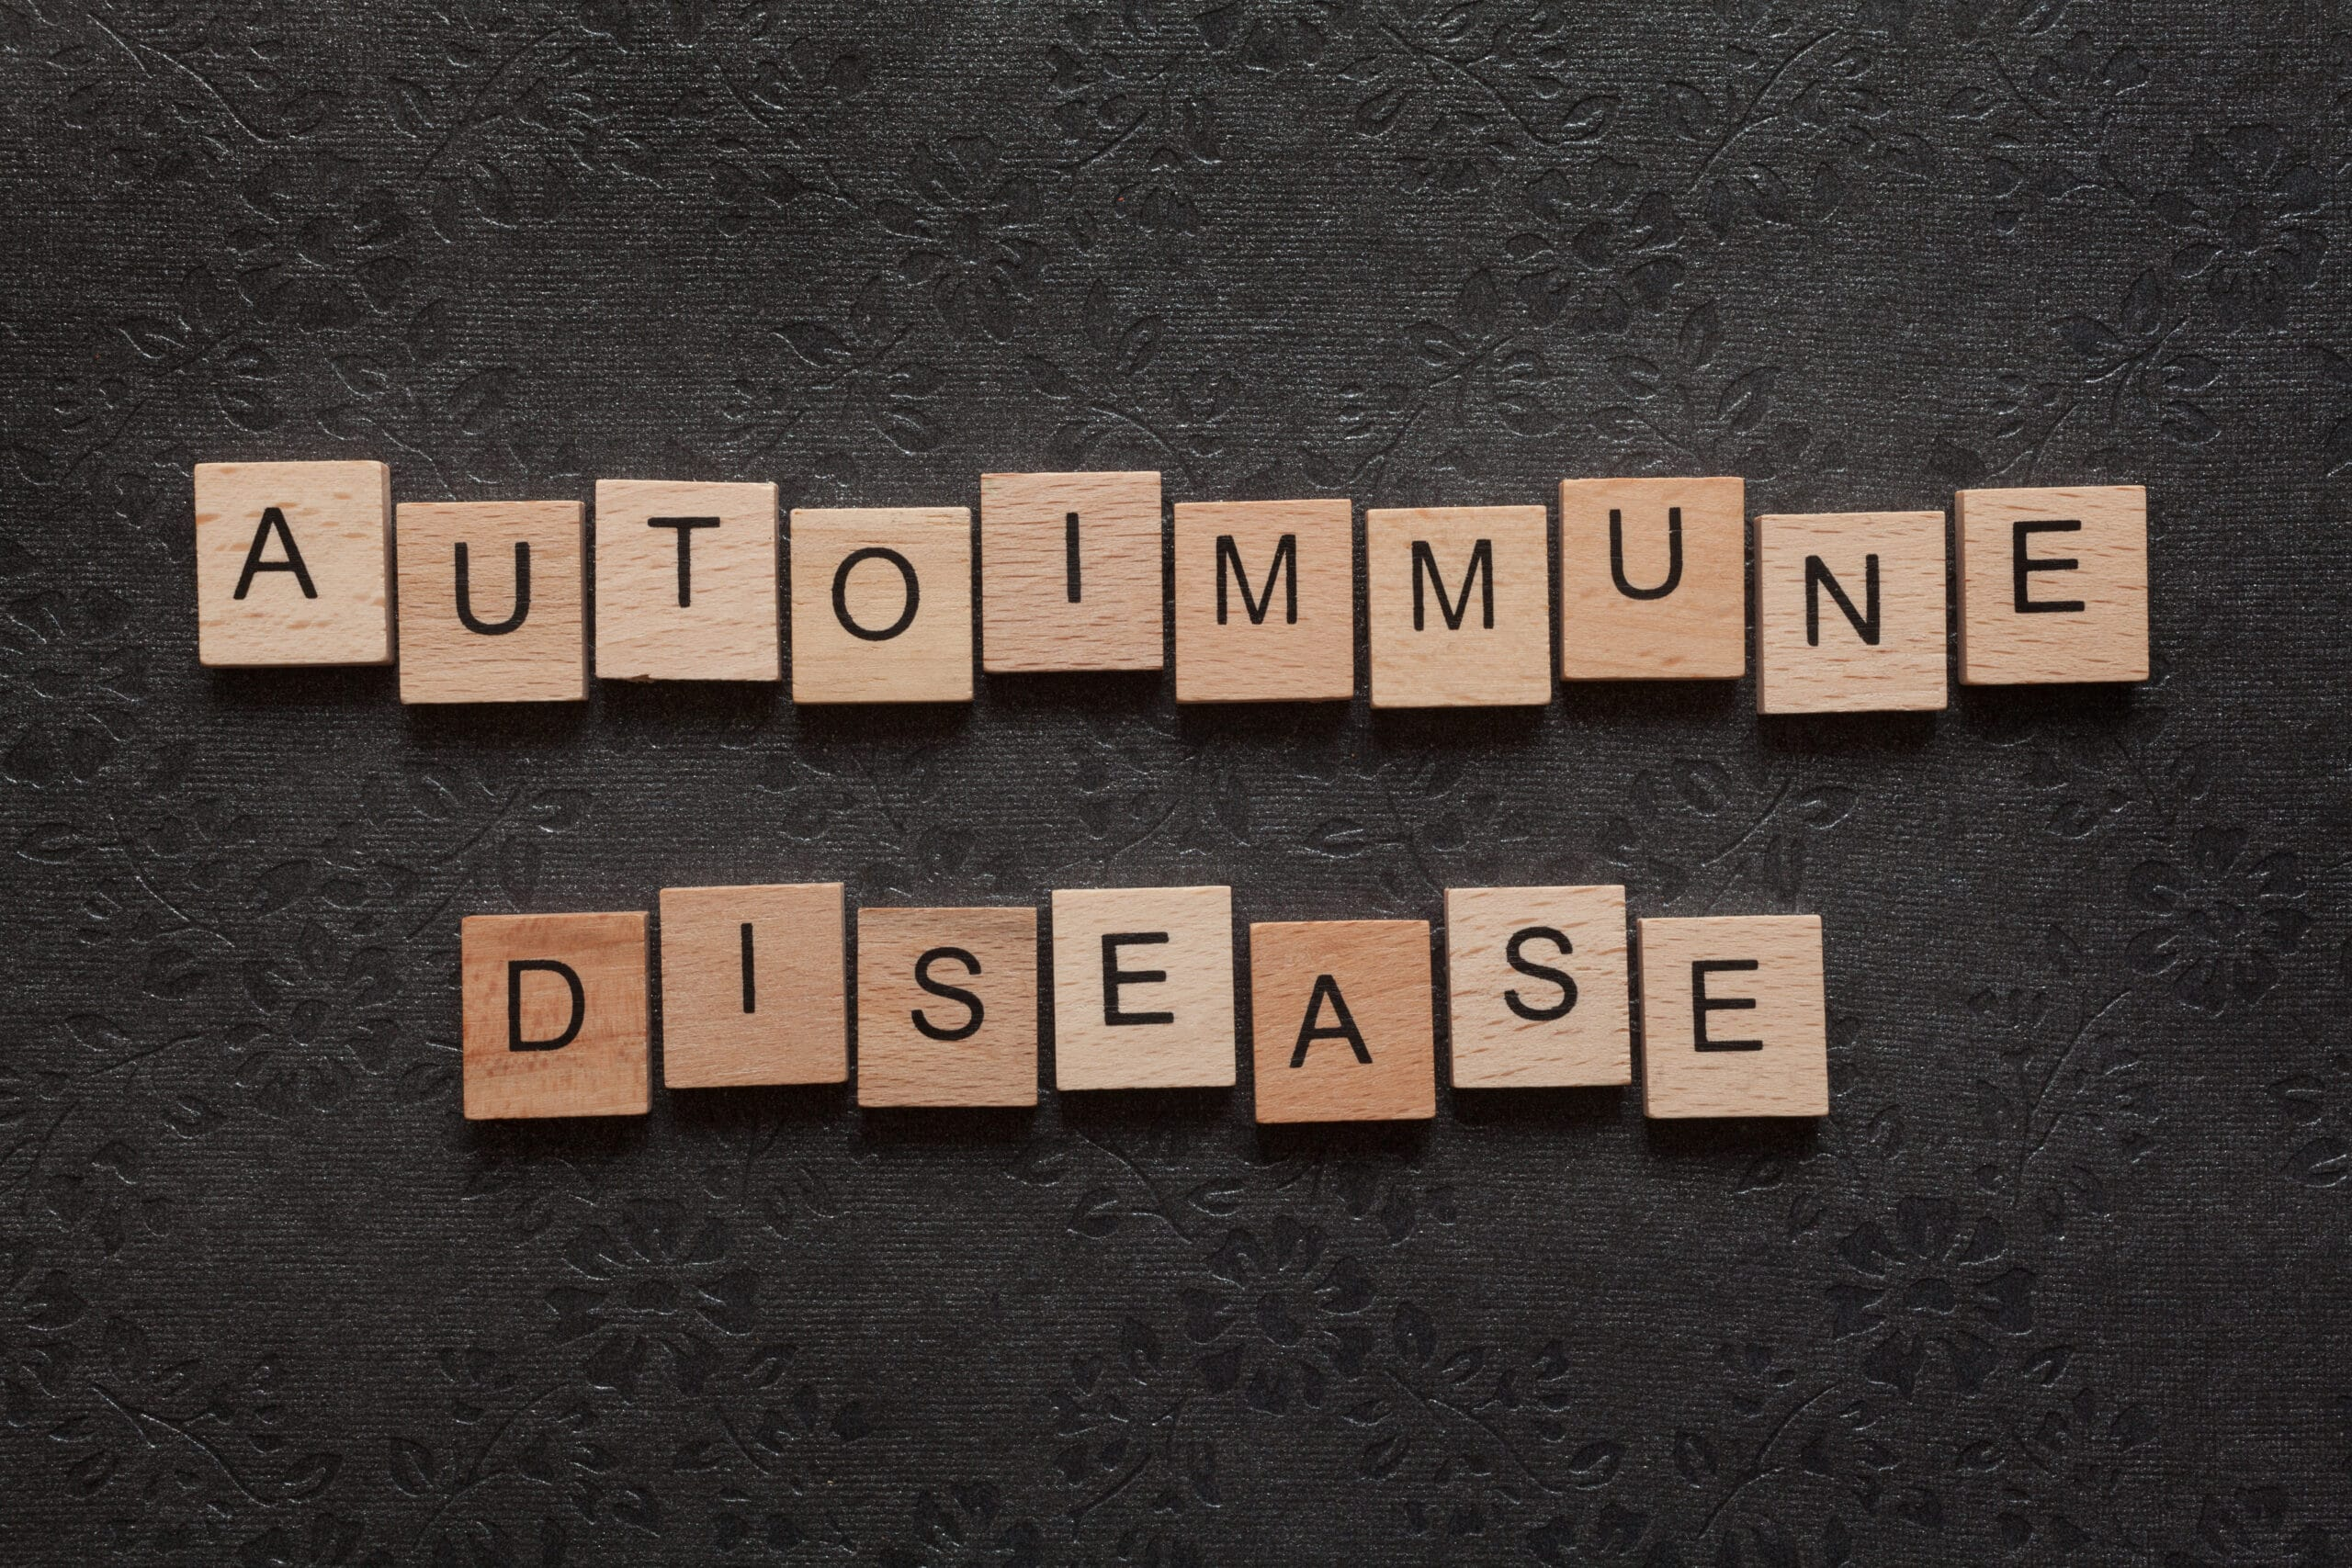 Autoimmune diseases can affect oral health